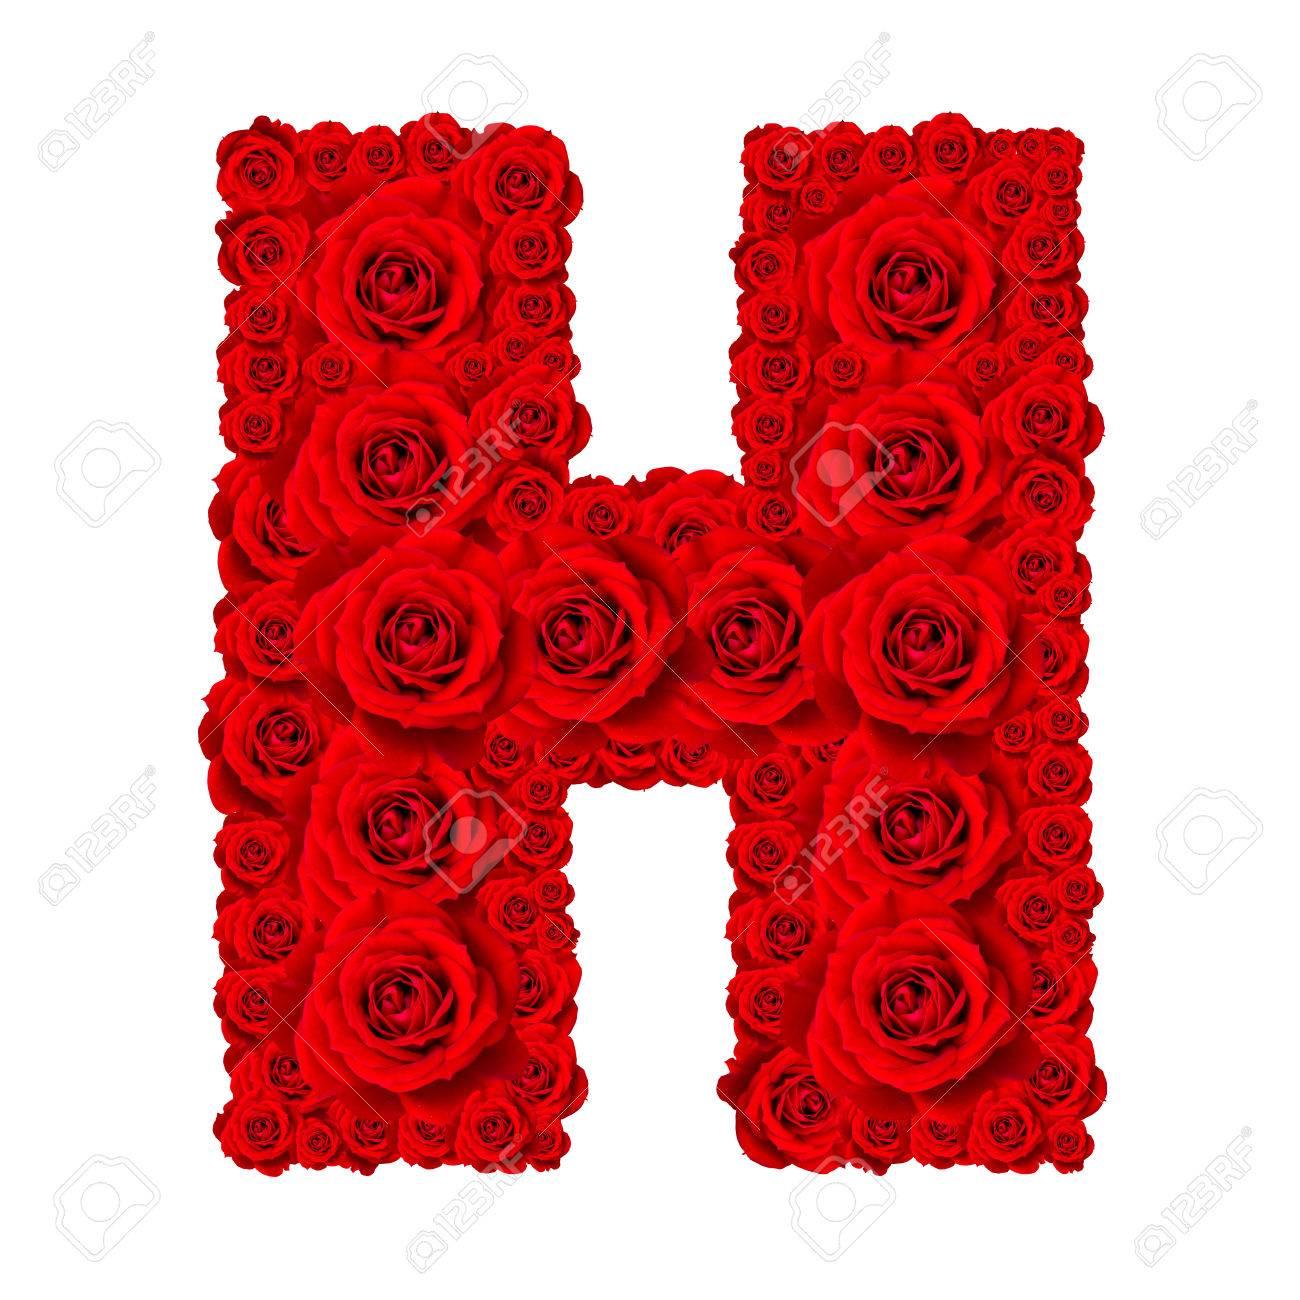 H Letter Images.Rose Alphabet Set Alphabet Capital Letter H Made From Red Rose